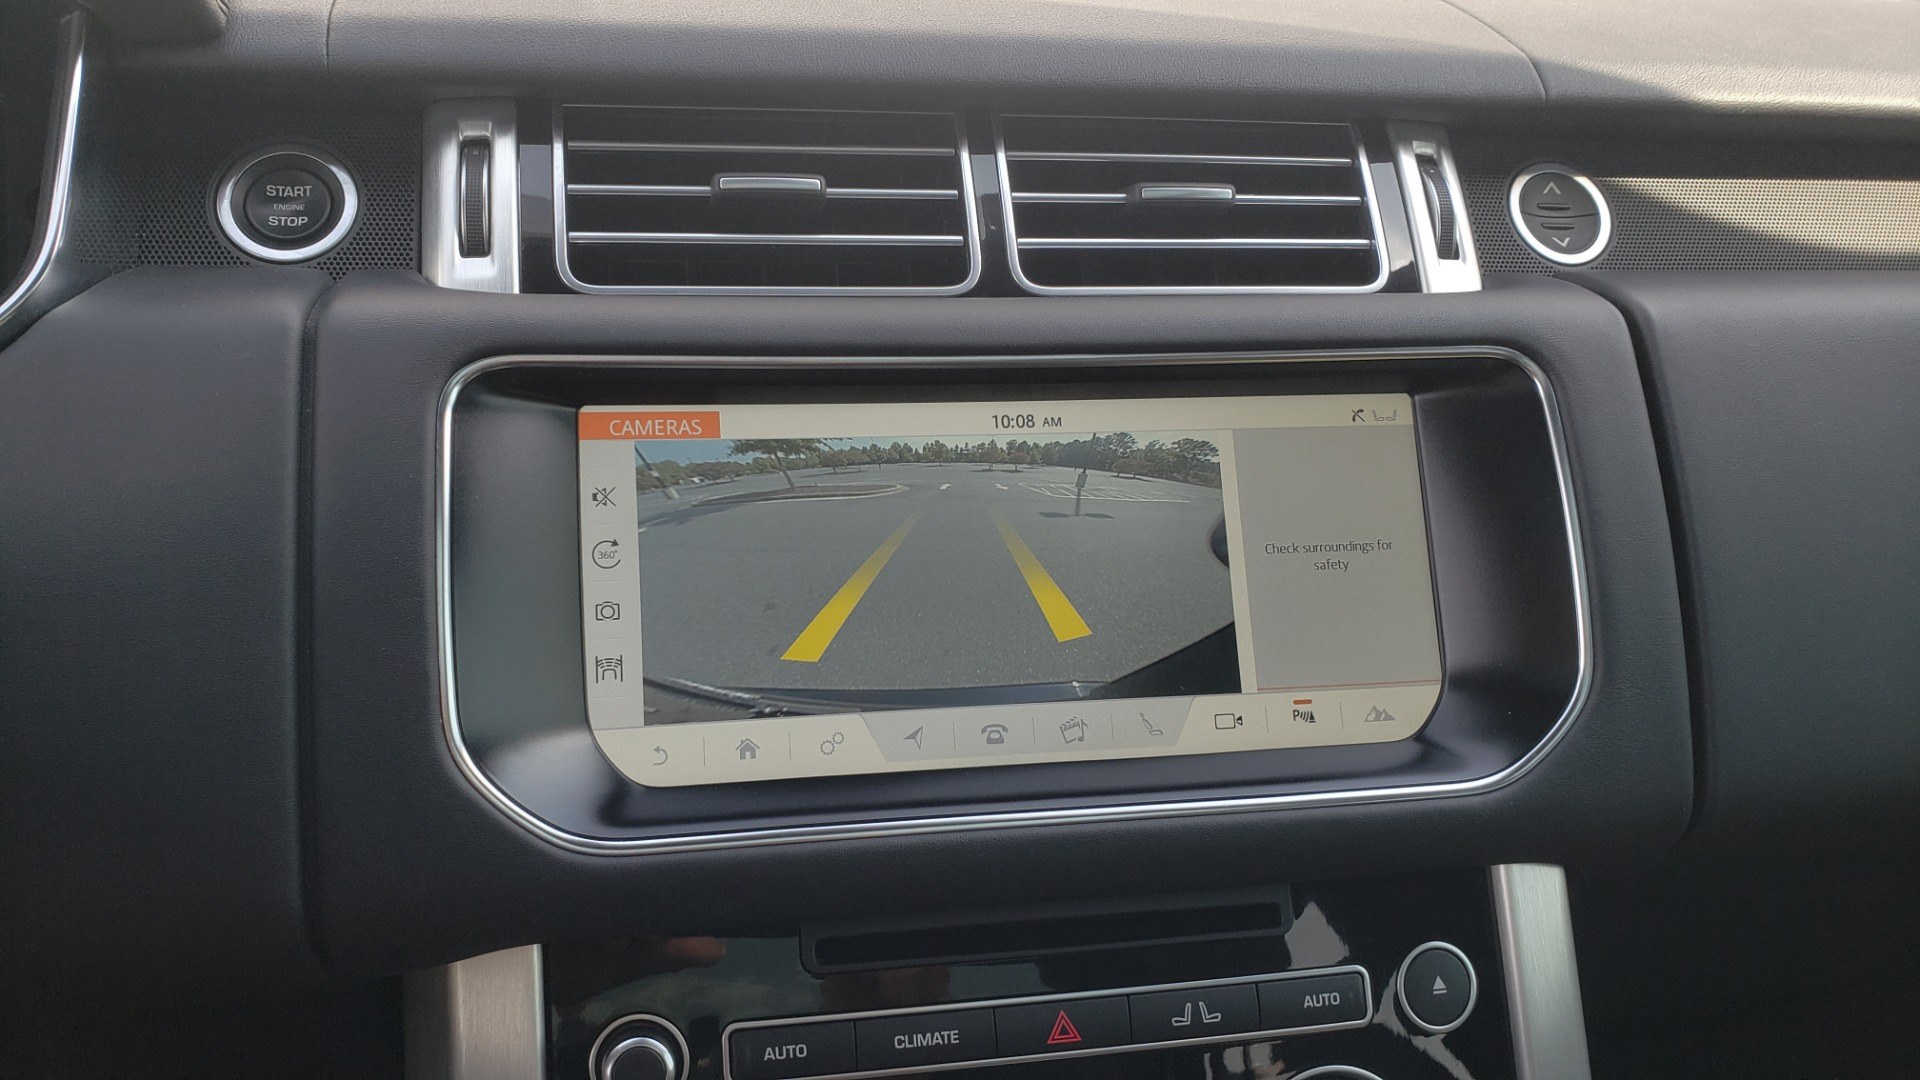 Used 2017 Land Rover RANGE ROVER SC V8 / VISION ASST / DRIVE PKG / MERIDIAN SOUND / PANO-ROOF / NAV / BSM for sale $75,995 at Formula Imports in Charlotte NC 28227 53